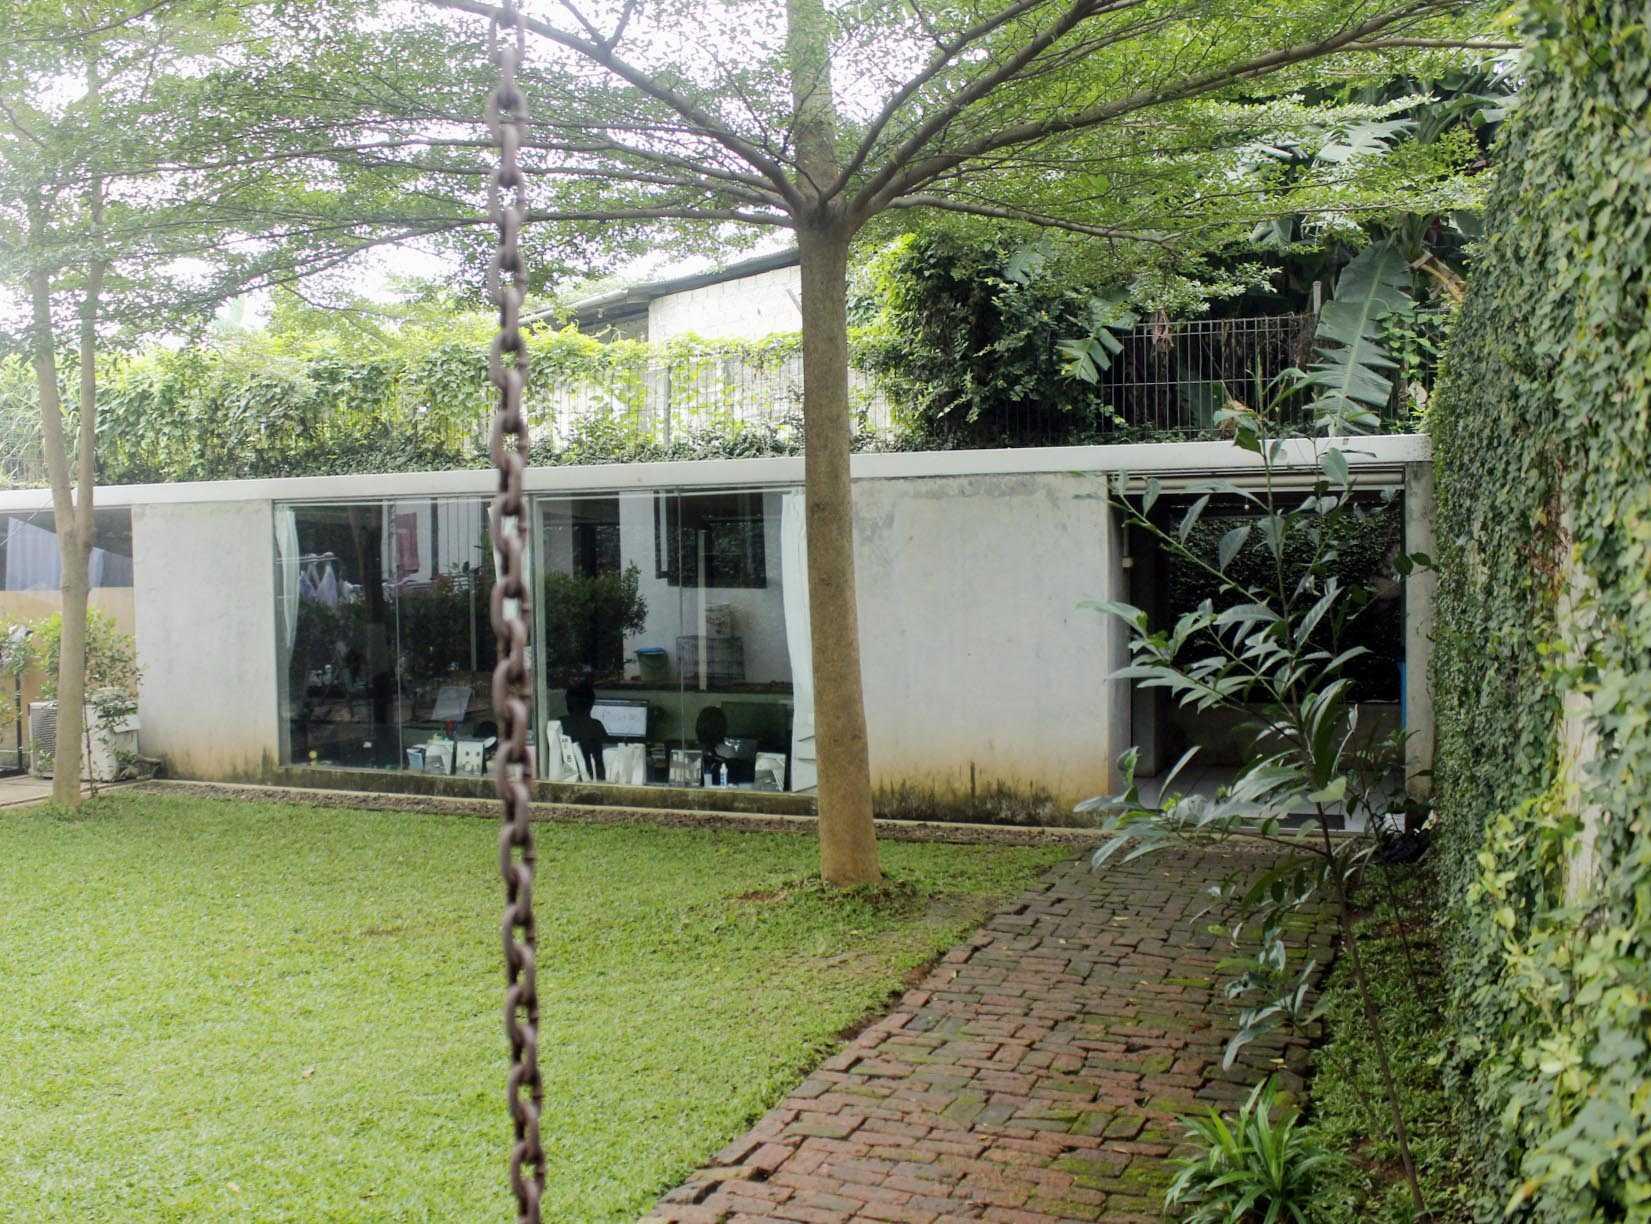 Monokroma Architect Monokroma Architect Office Lippo Karawaci Lippo Karawaci 1-Exterior Modern  23582